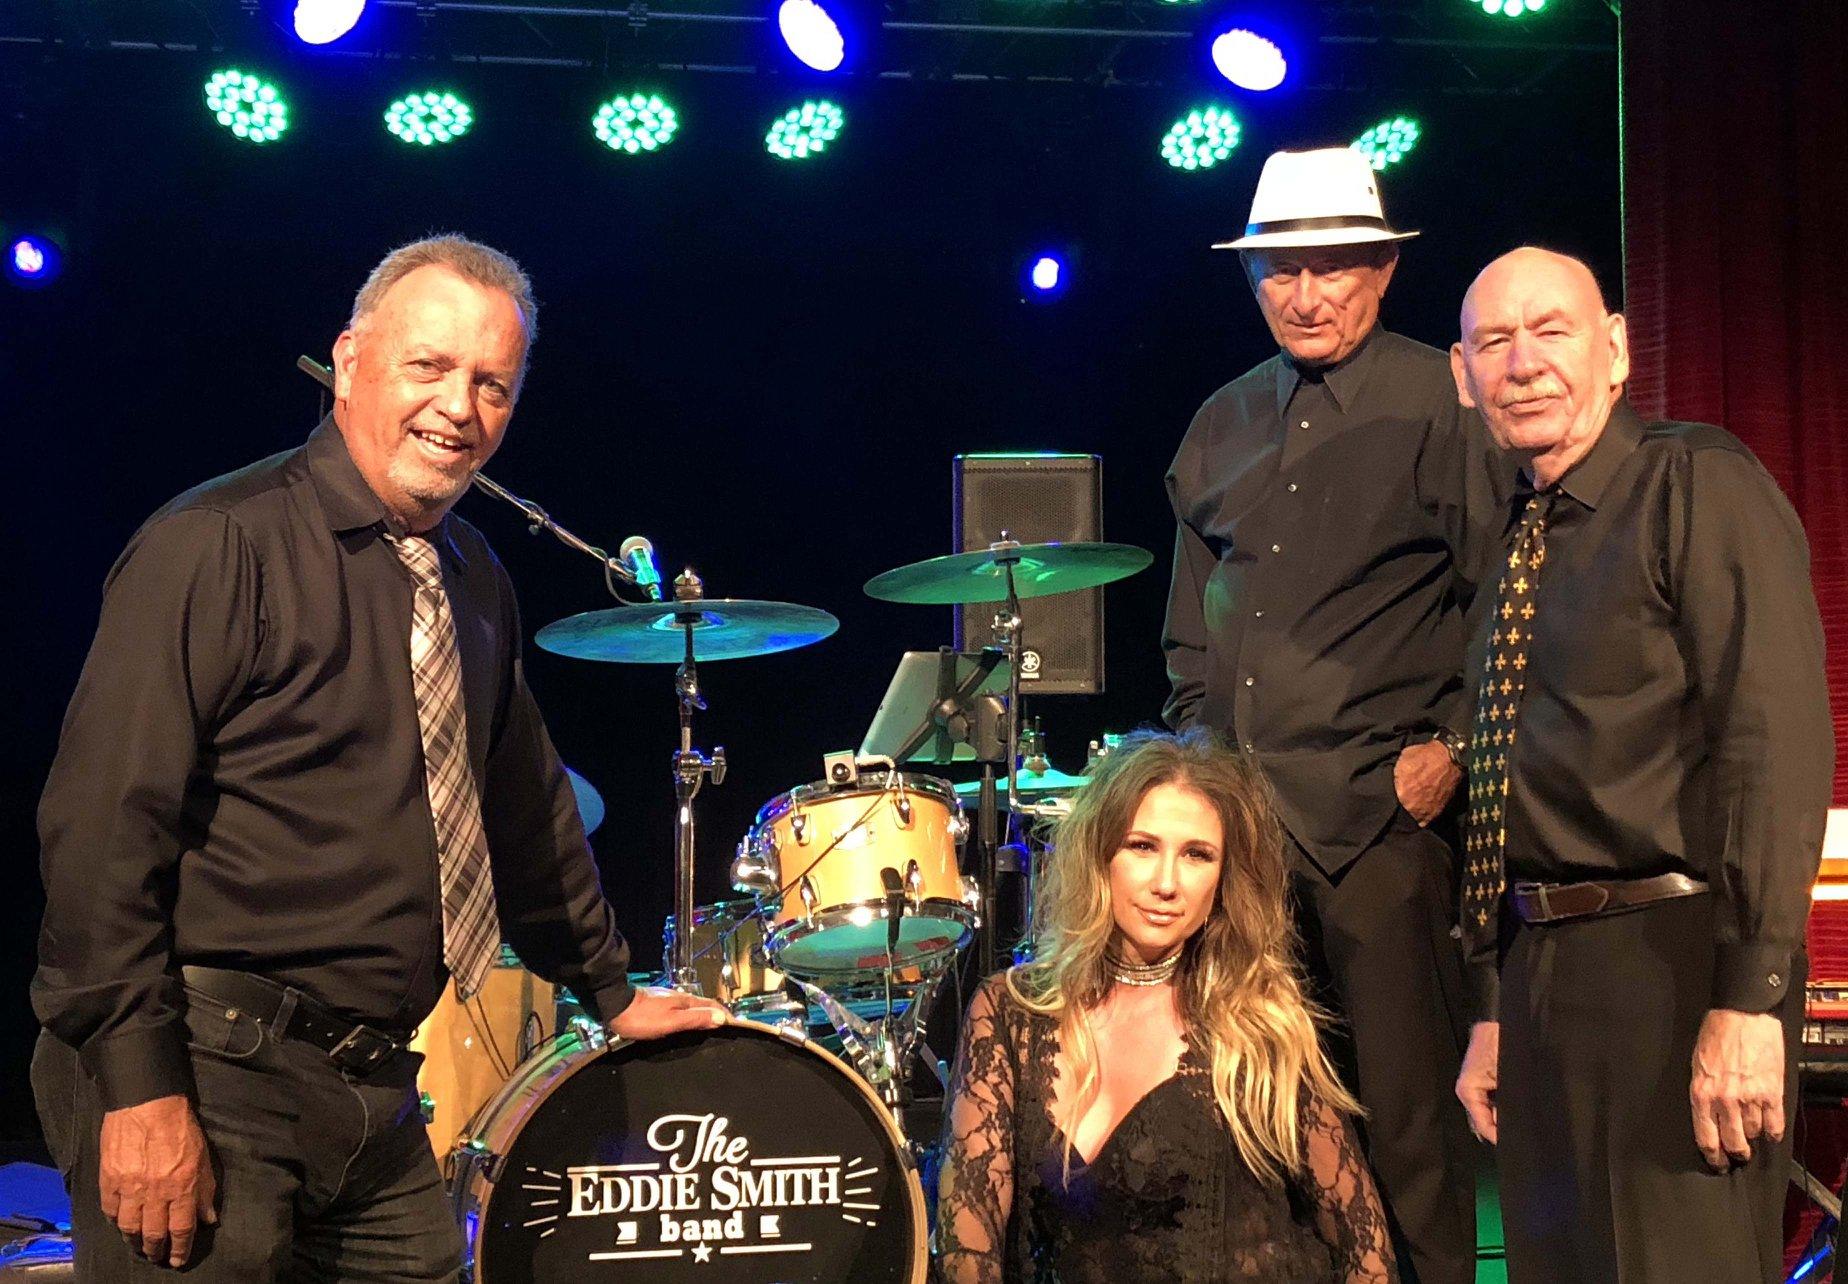 Eddie Smith Band